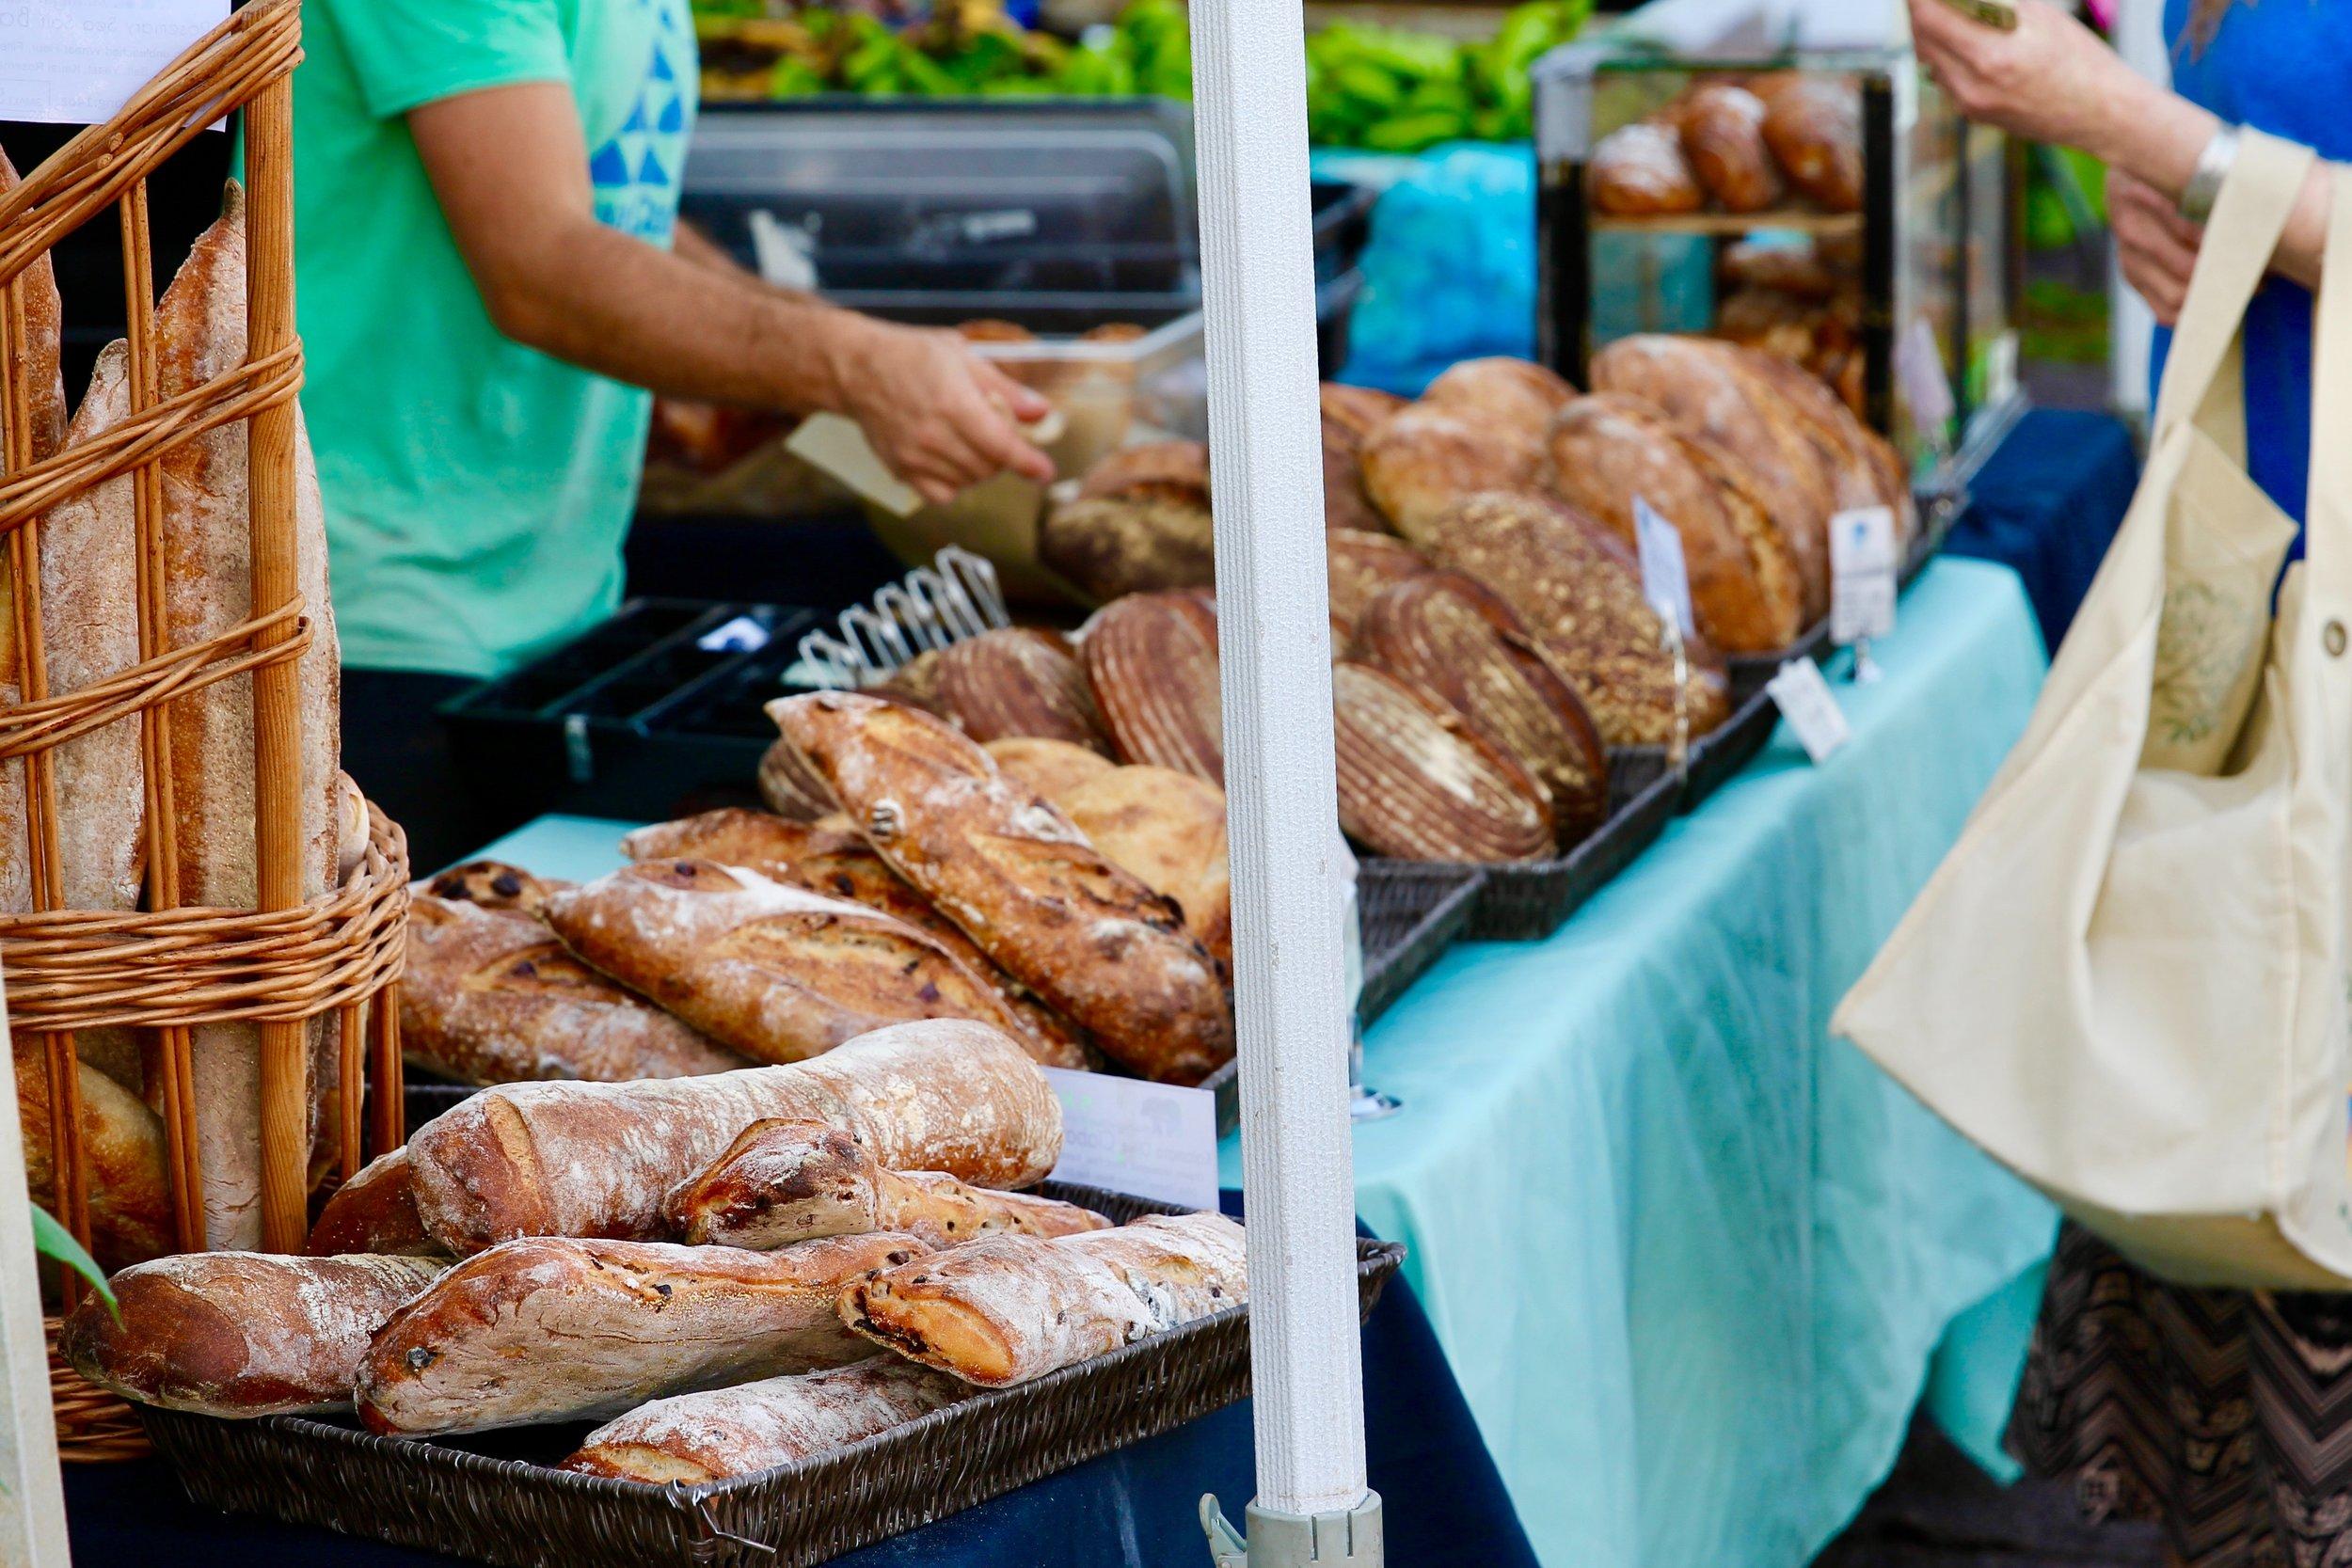 Kakaako Farmers Market - So many fresh local artisans  333 Ward Ave, Honolulu, HI 96814